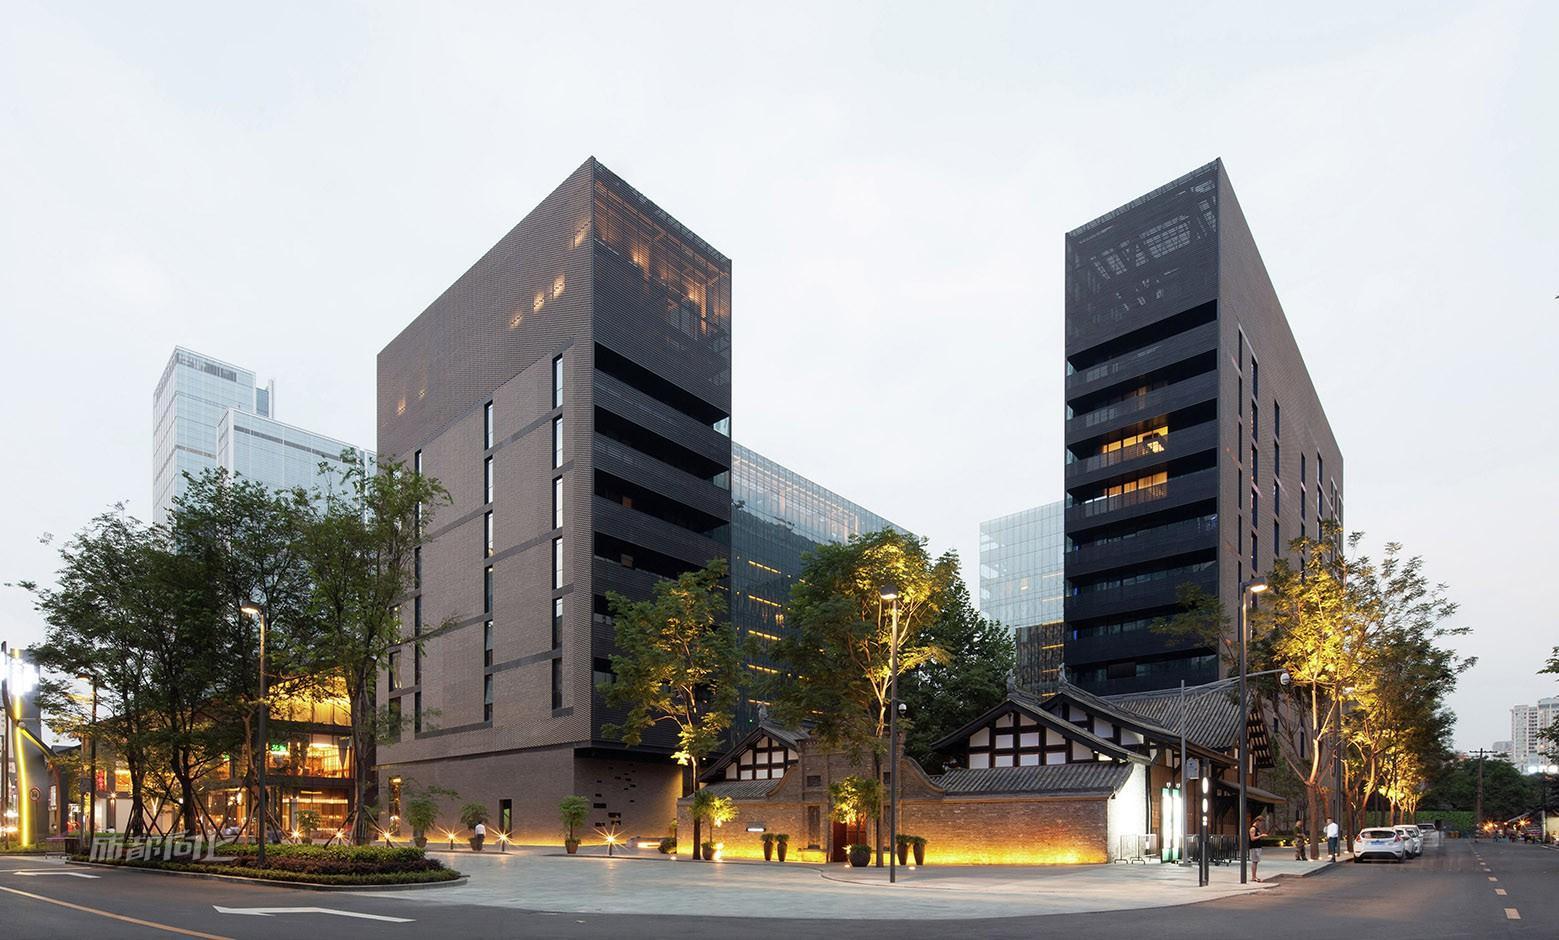 Hospital Facade Design Architecture